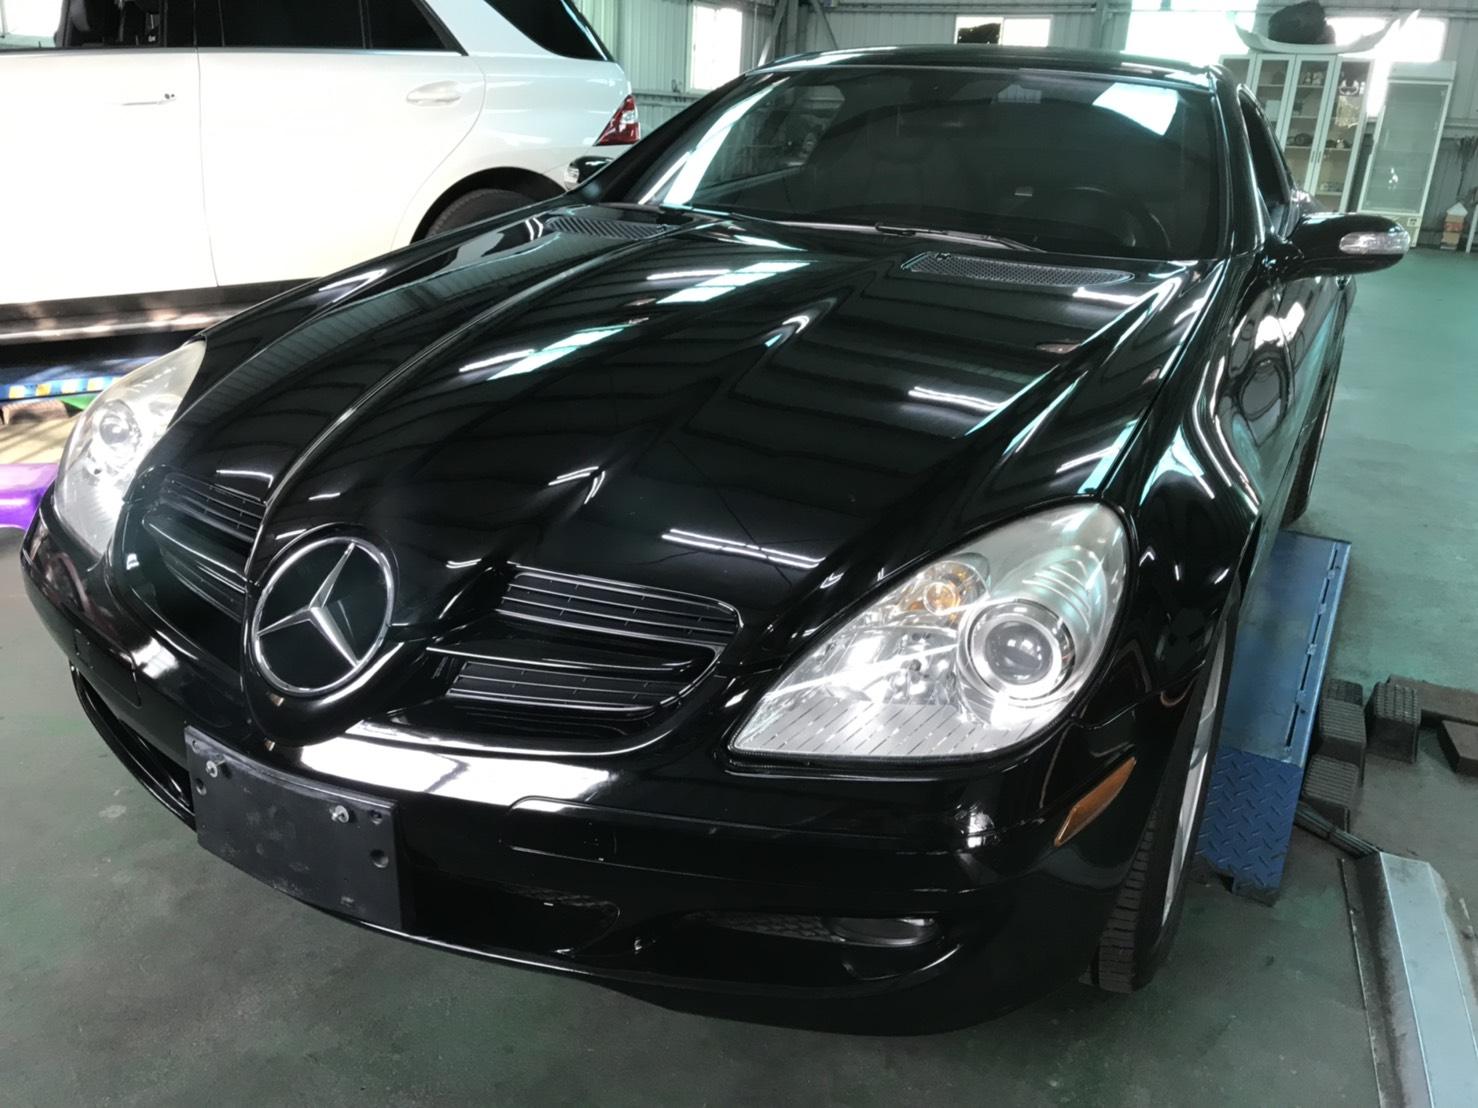 2007 M-Benz 賓士 Slk